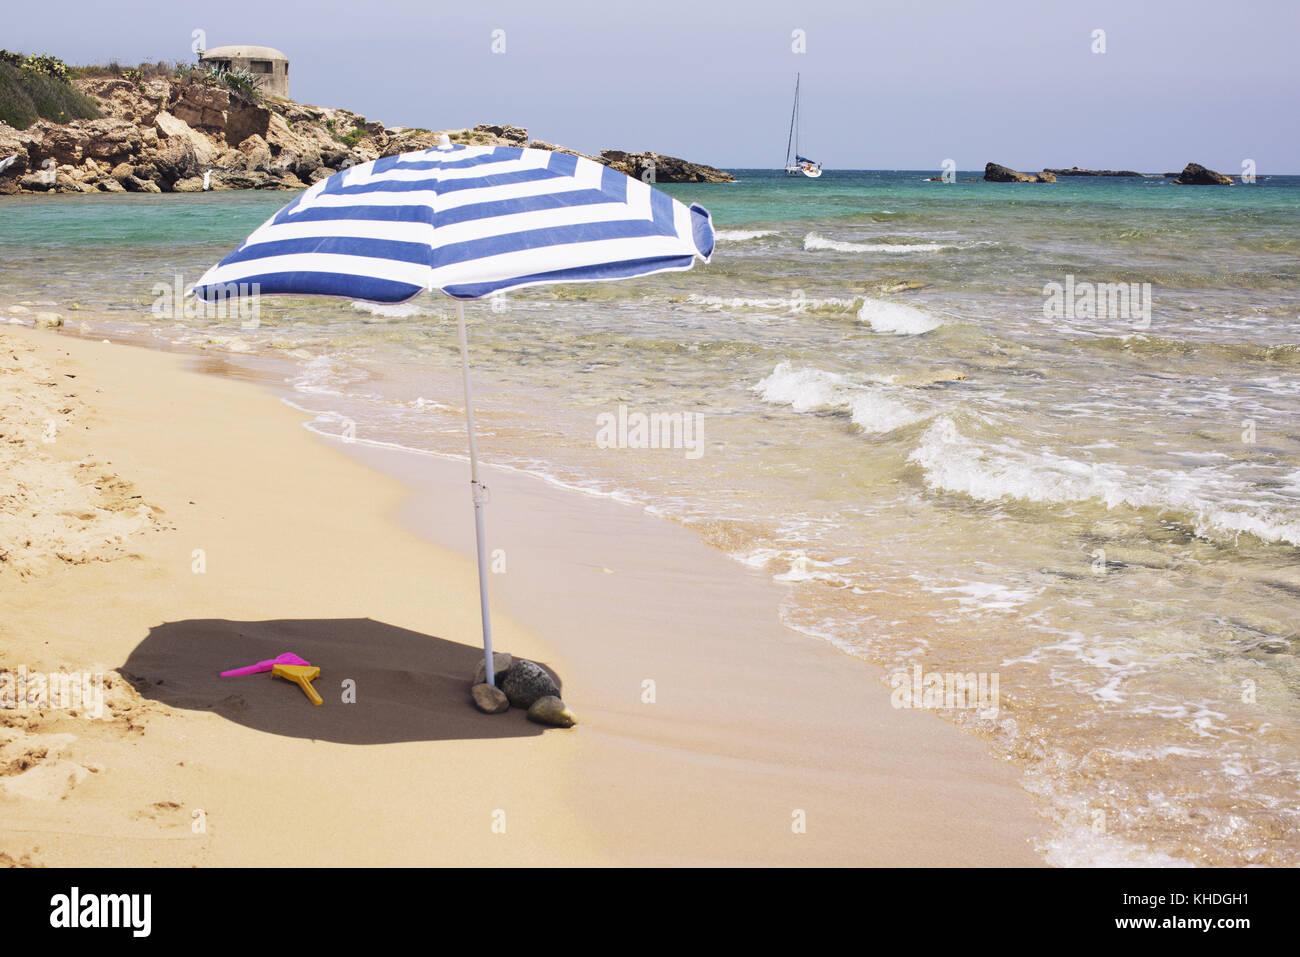 Parasol on beach near water's edge Stock Photo